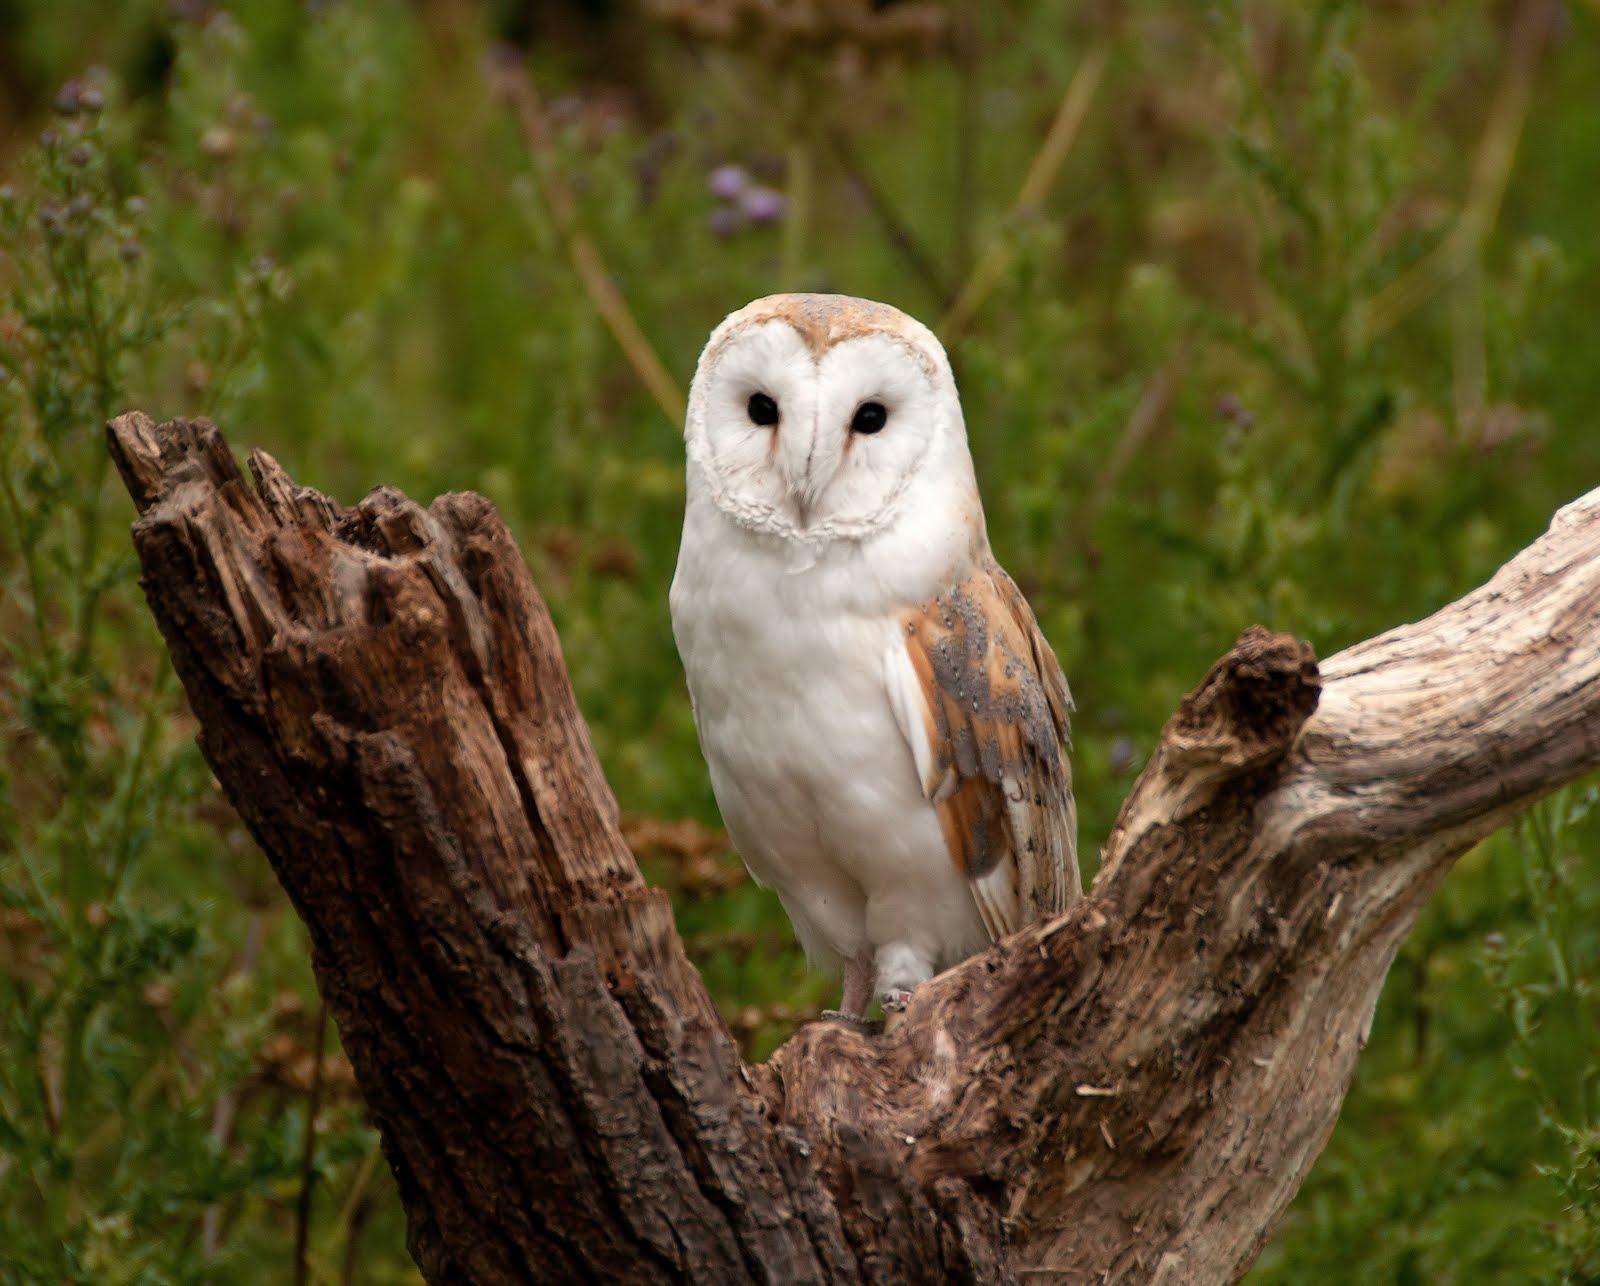 Anthony Miners Wildlife Photos: Barn Owl